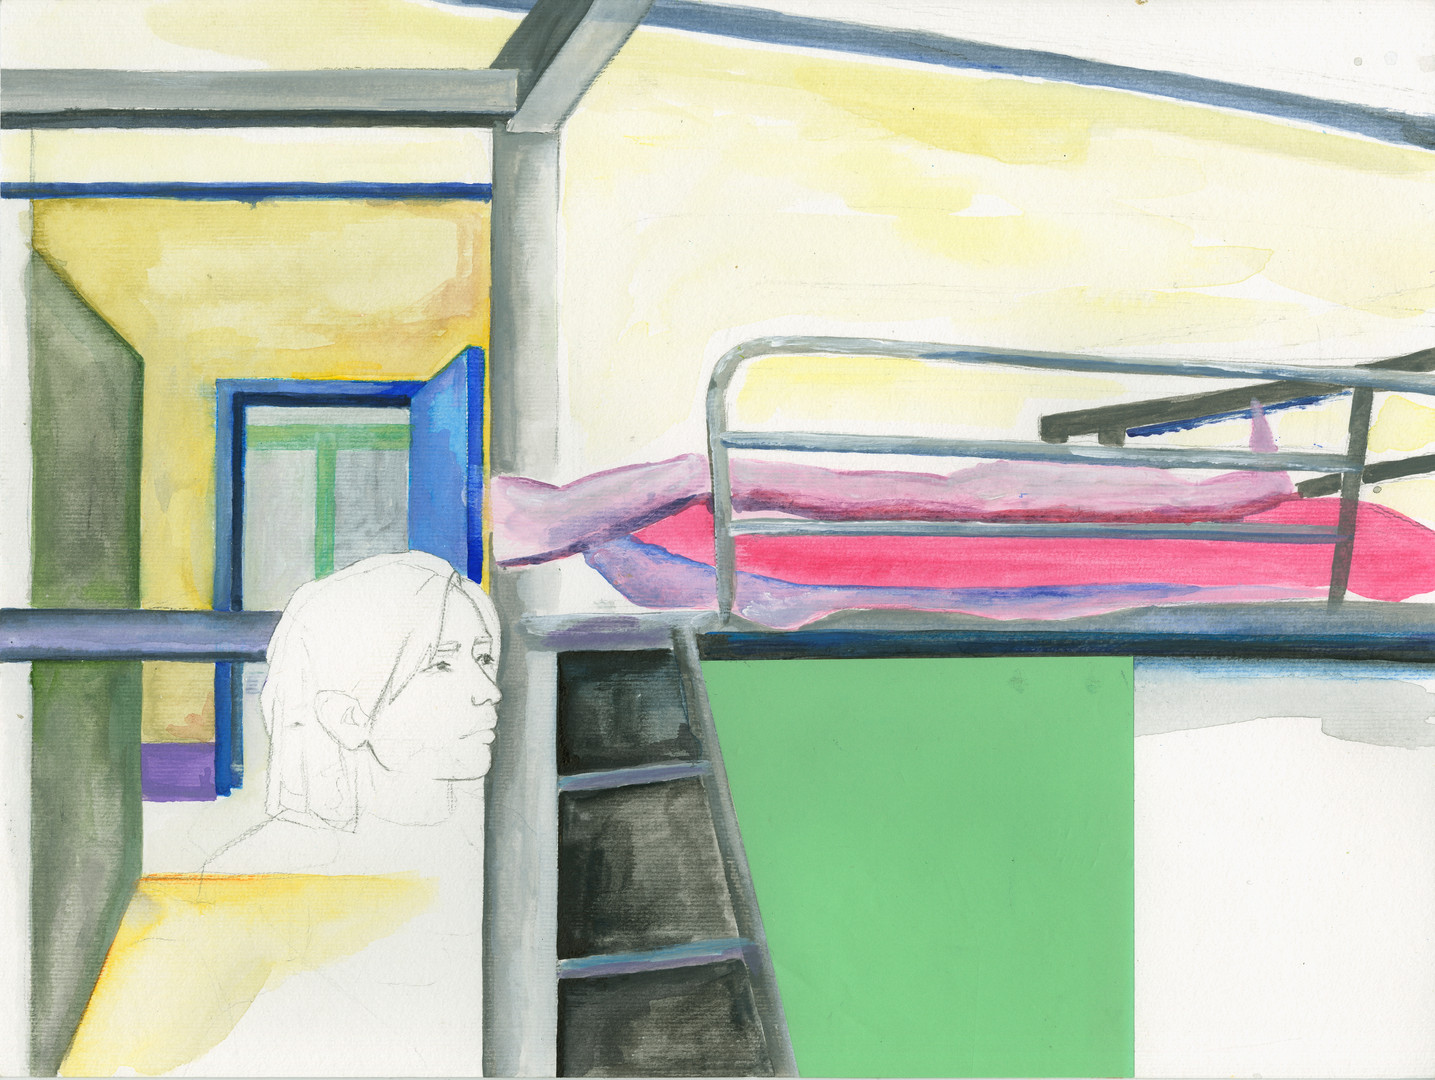 quiet dormitory